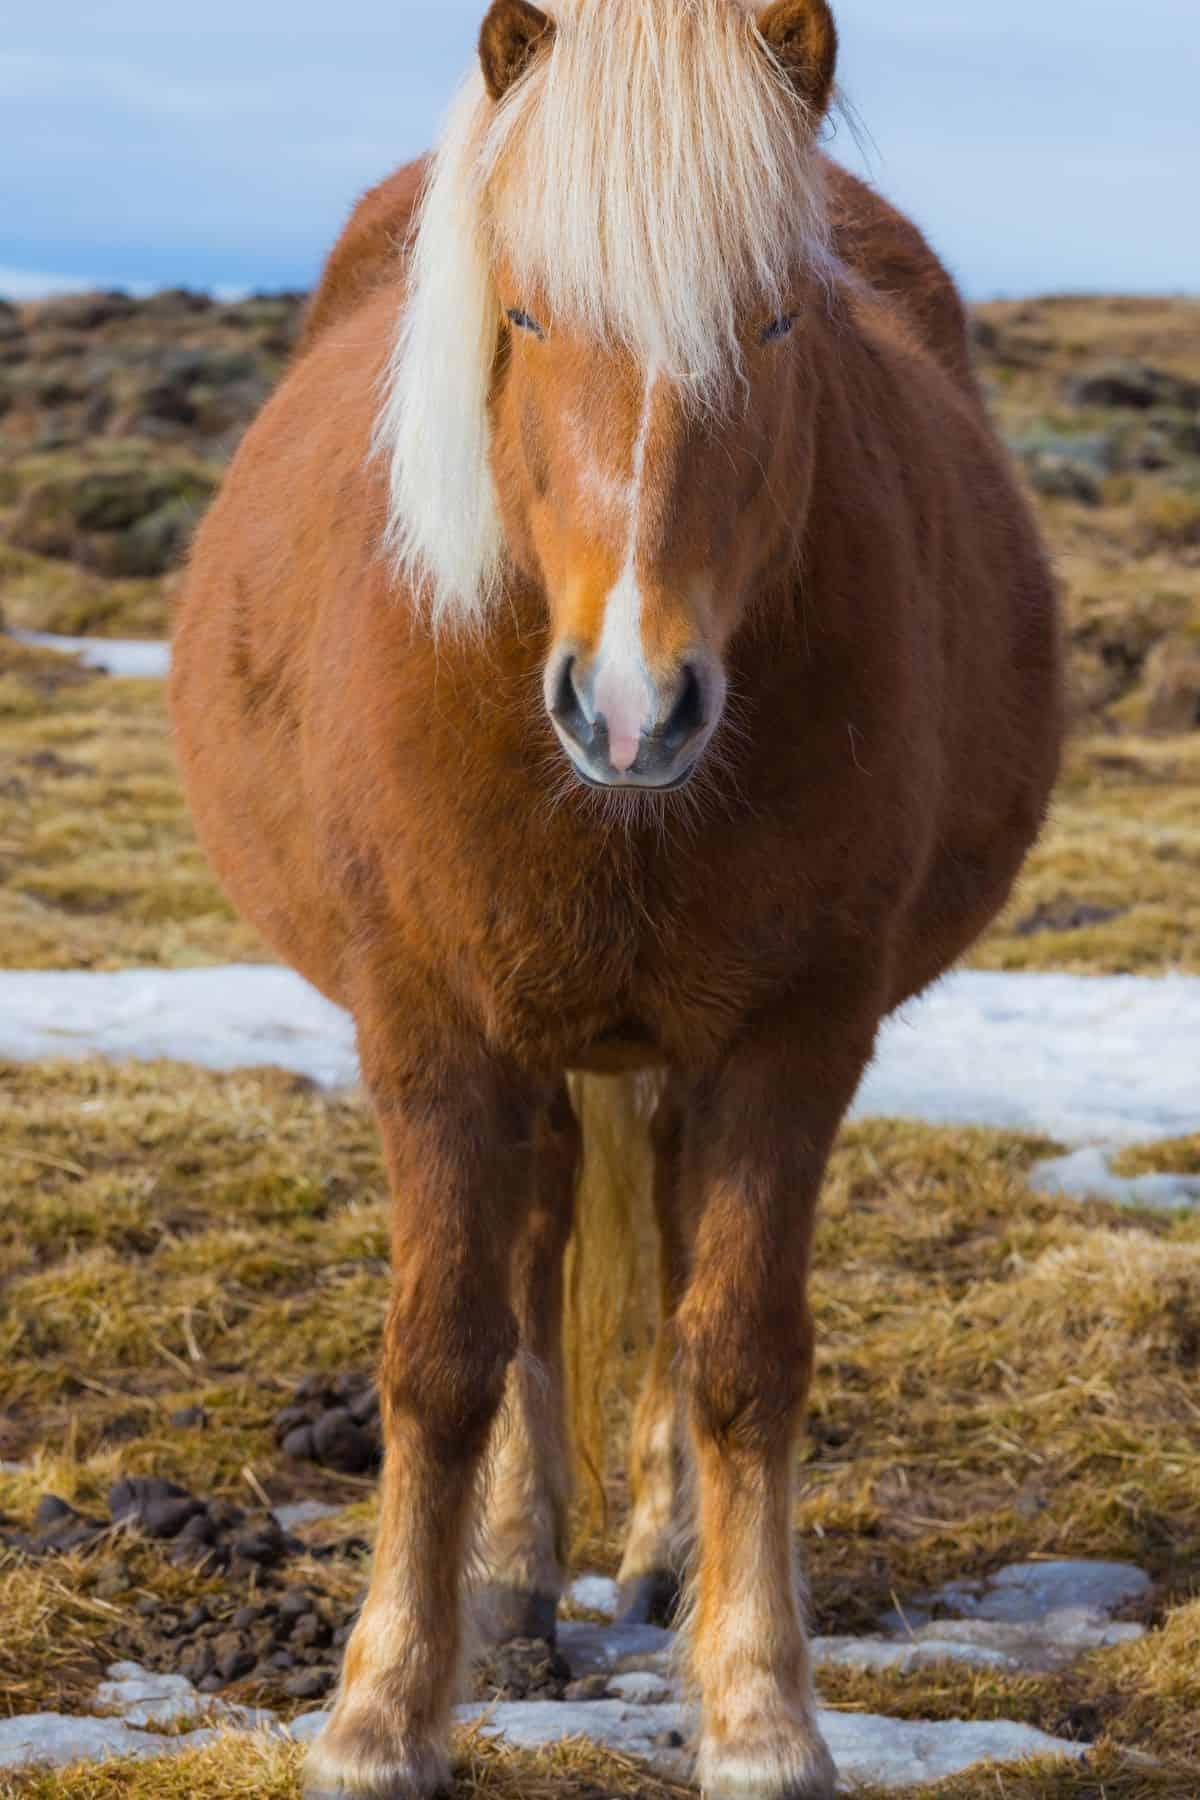 Blonde pregnant horse in mud